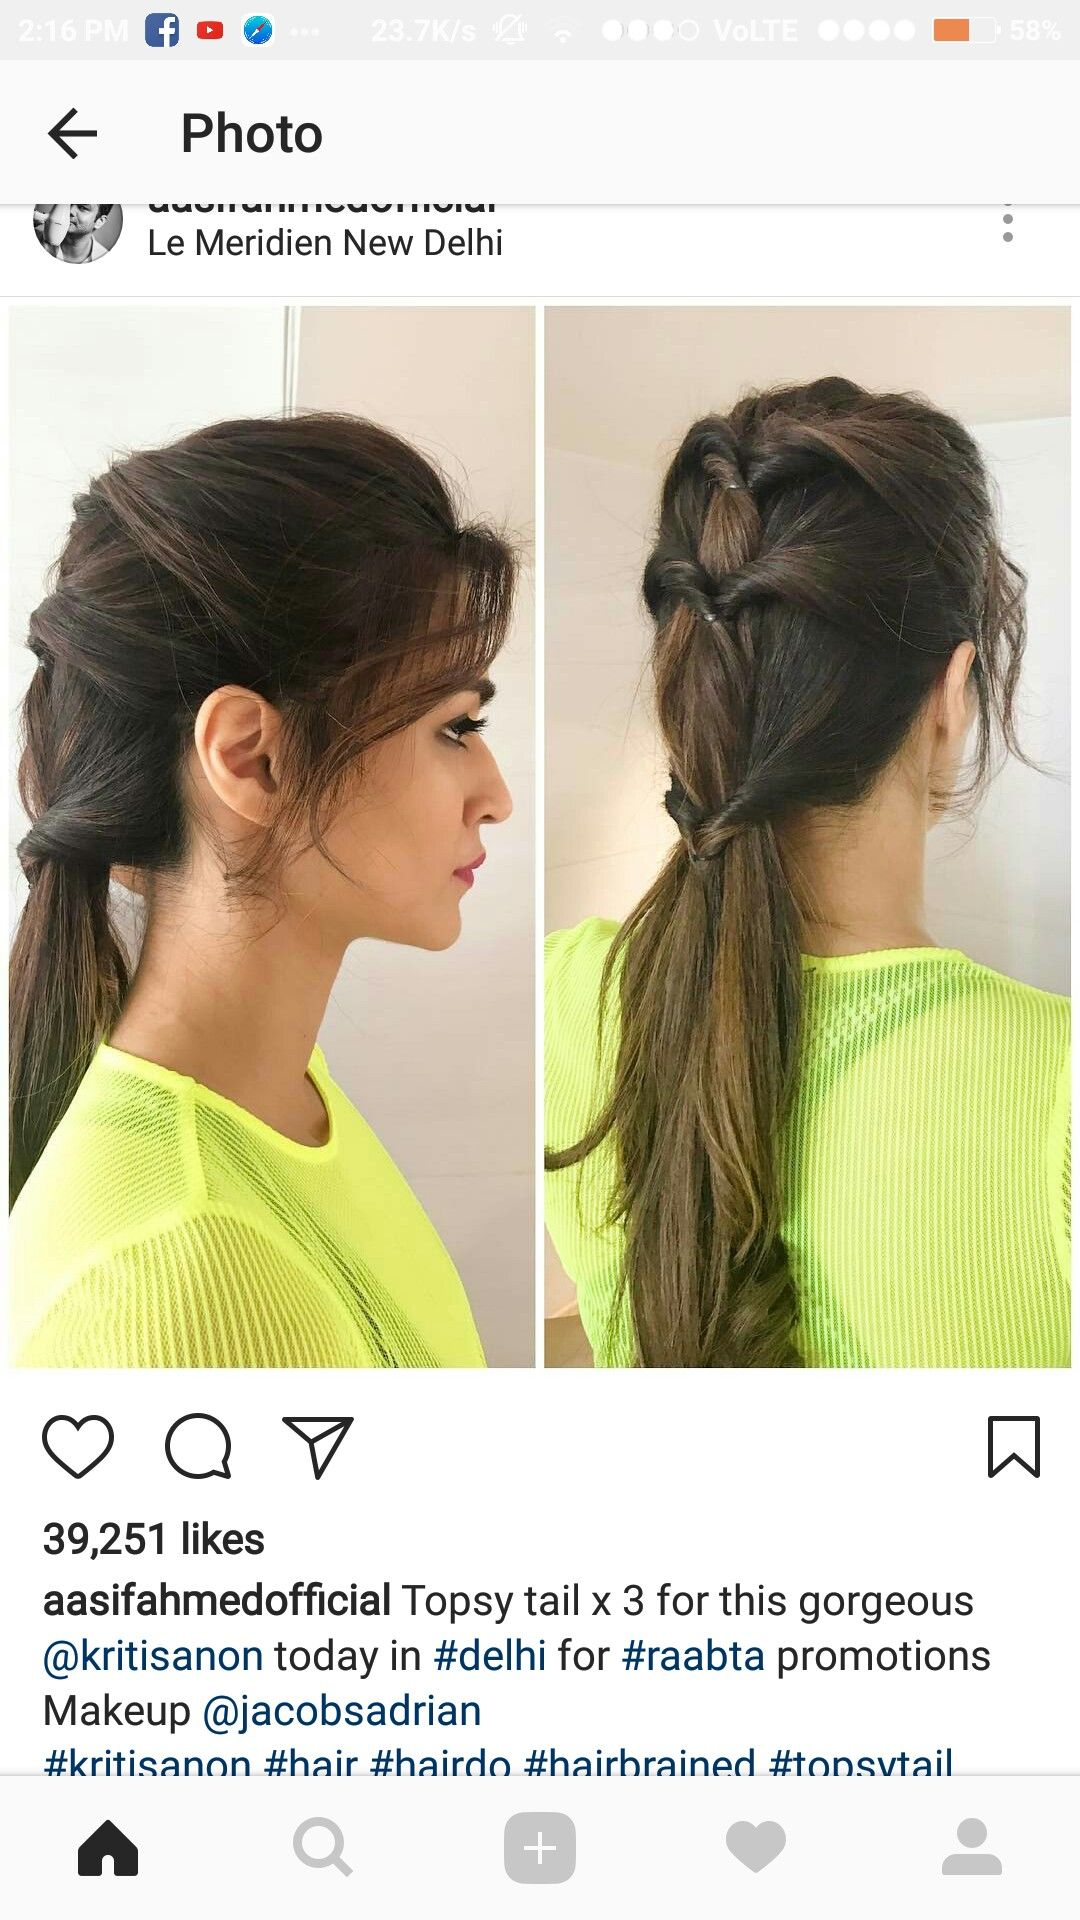 Pin By Darshana Chaudhari On Hairstyles Hair Styles Front Hair Styles Braid Hair Dos